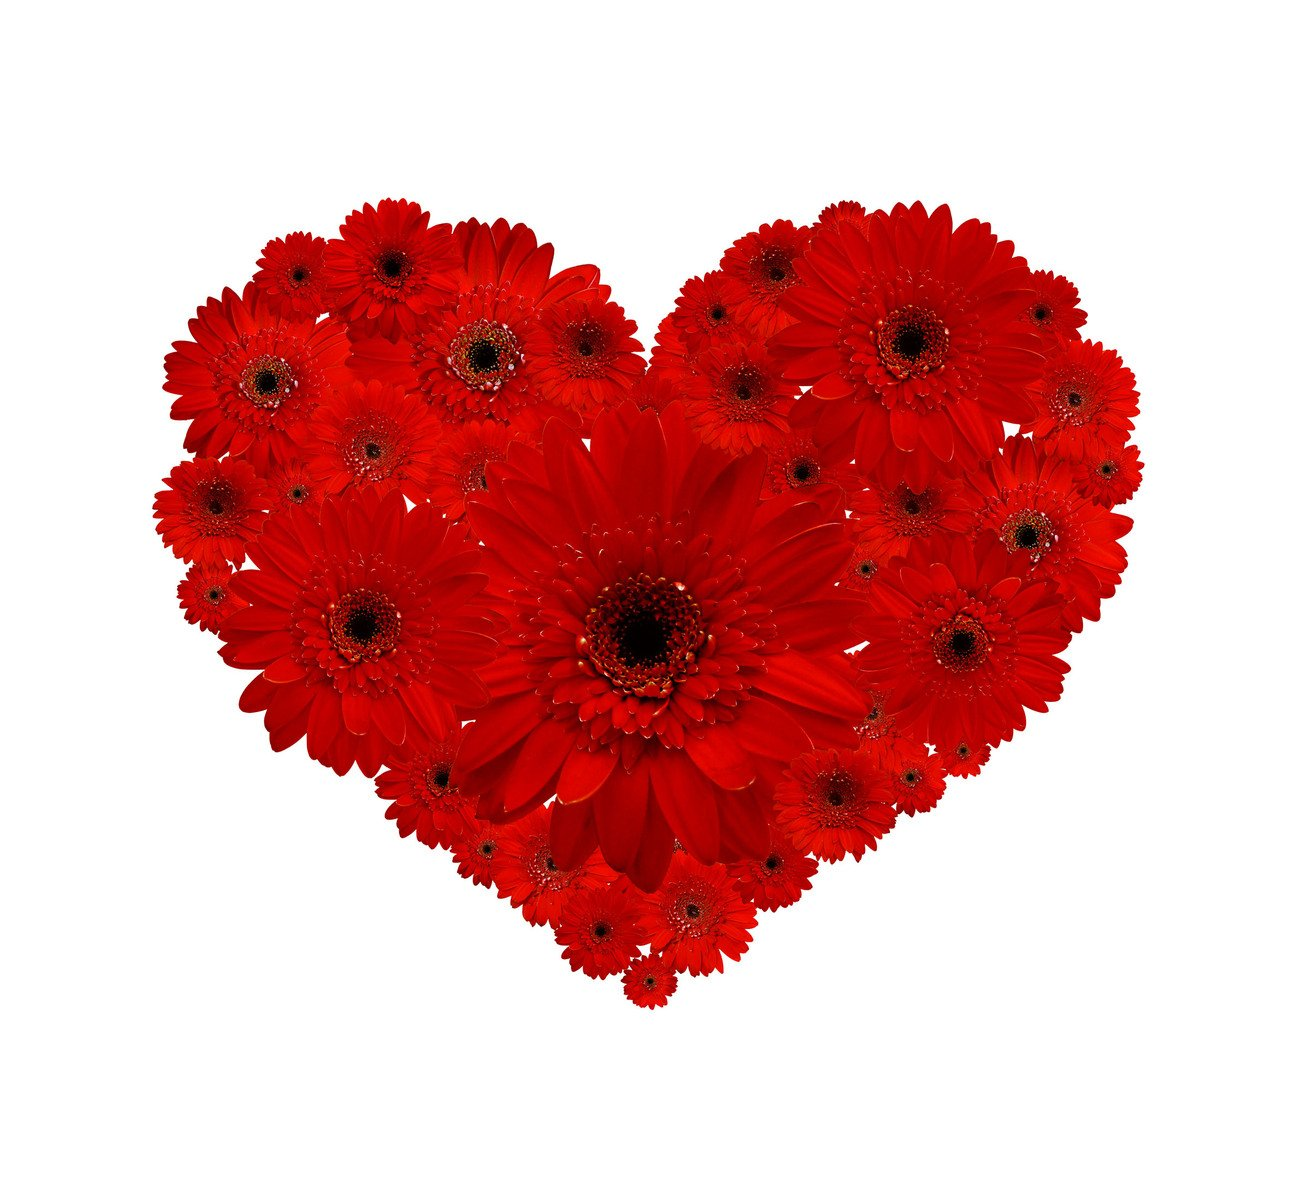 Free Corazón de flor roja 1 Stock Photo - FreeImages.com